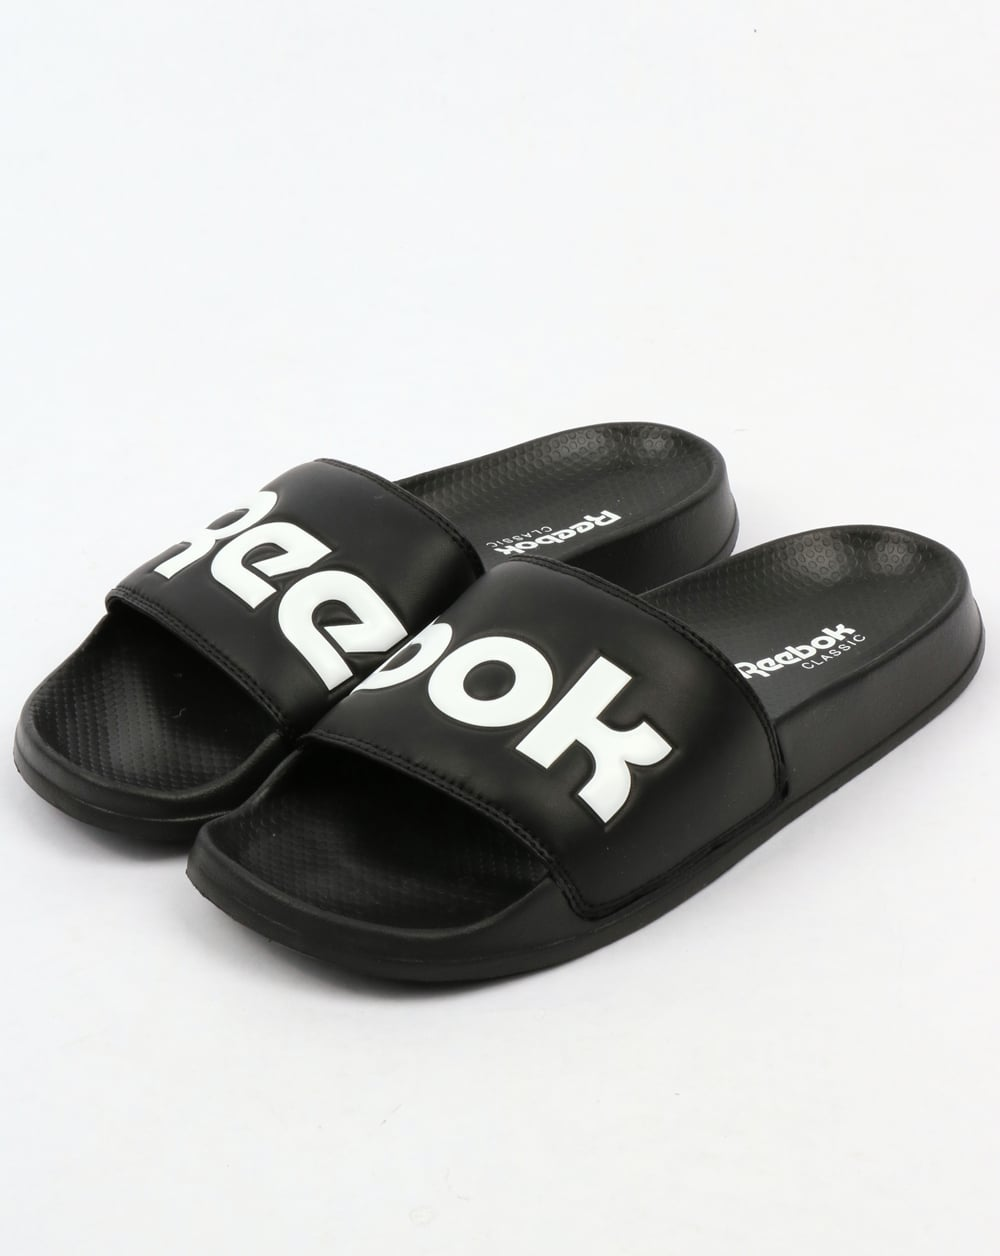 Reebok Classic Logo Sliders Black 80s Casual Classics